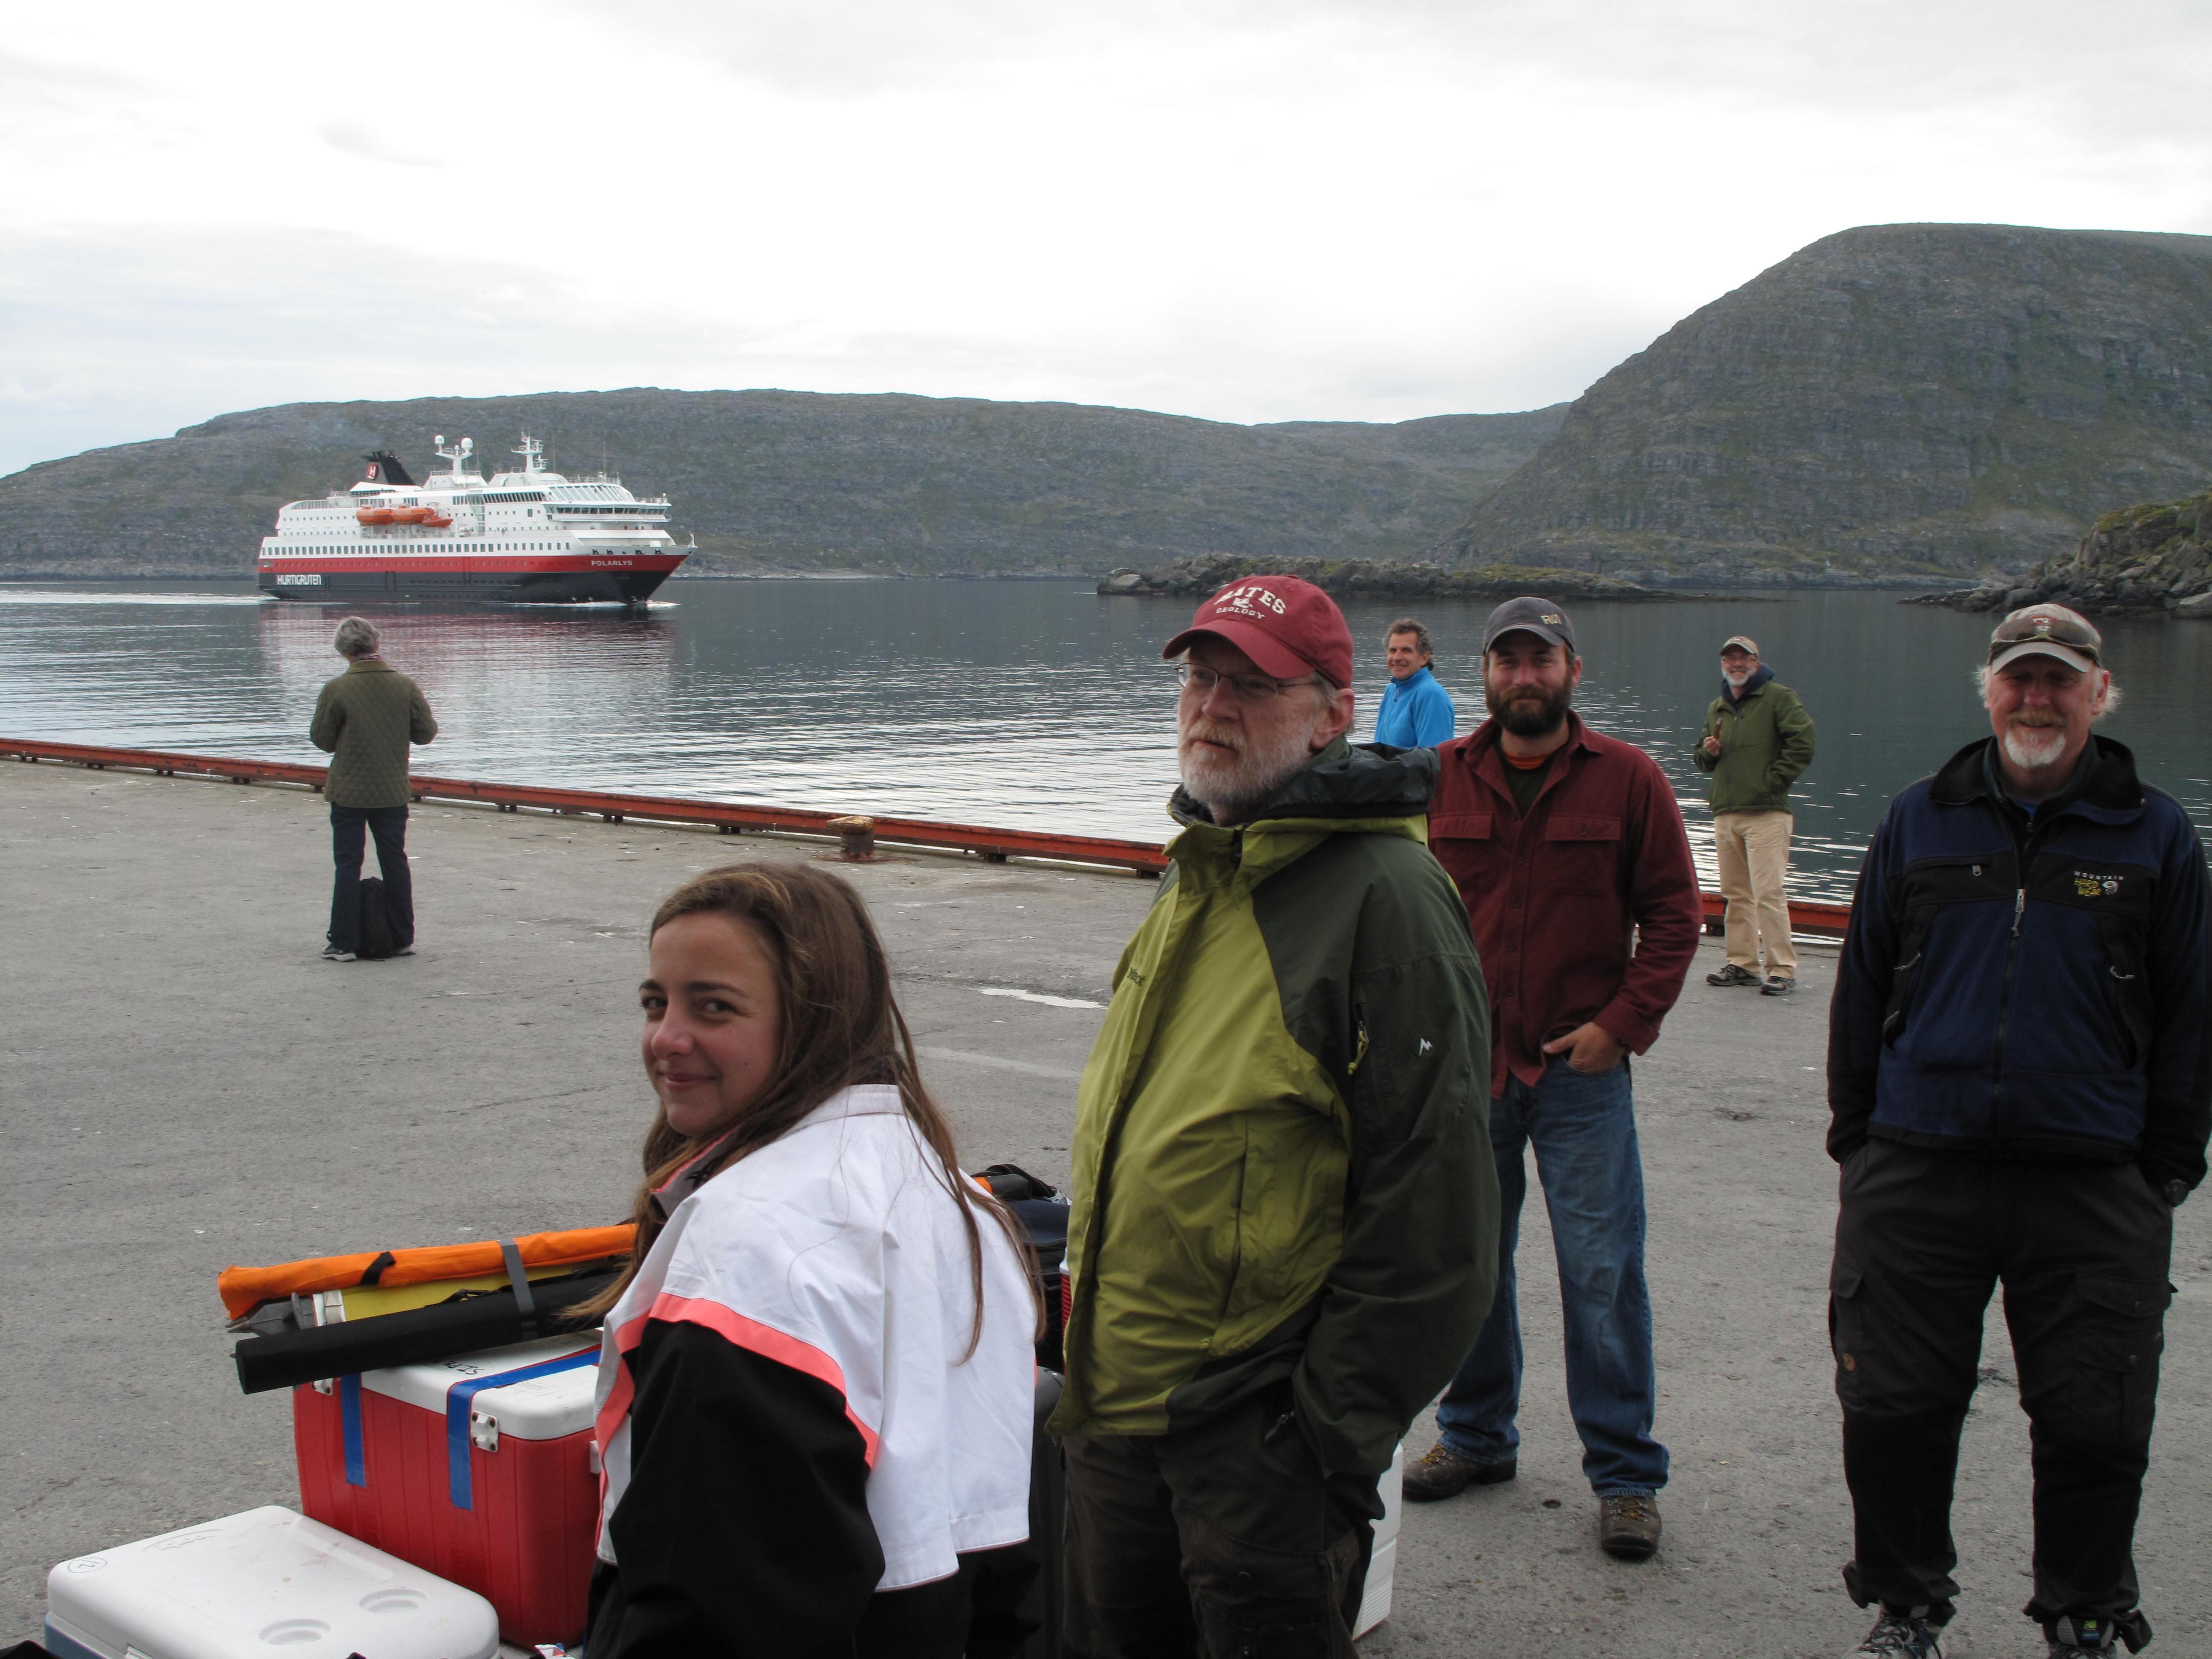 The crew and gear await the Hurtigruten.